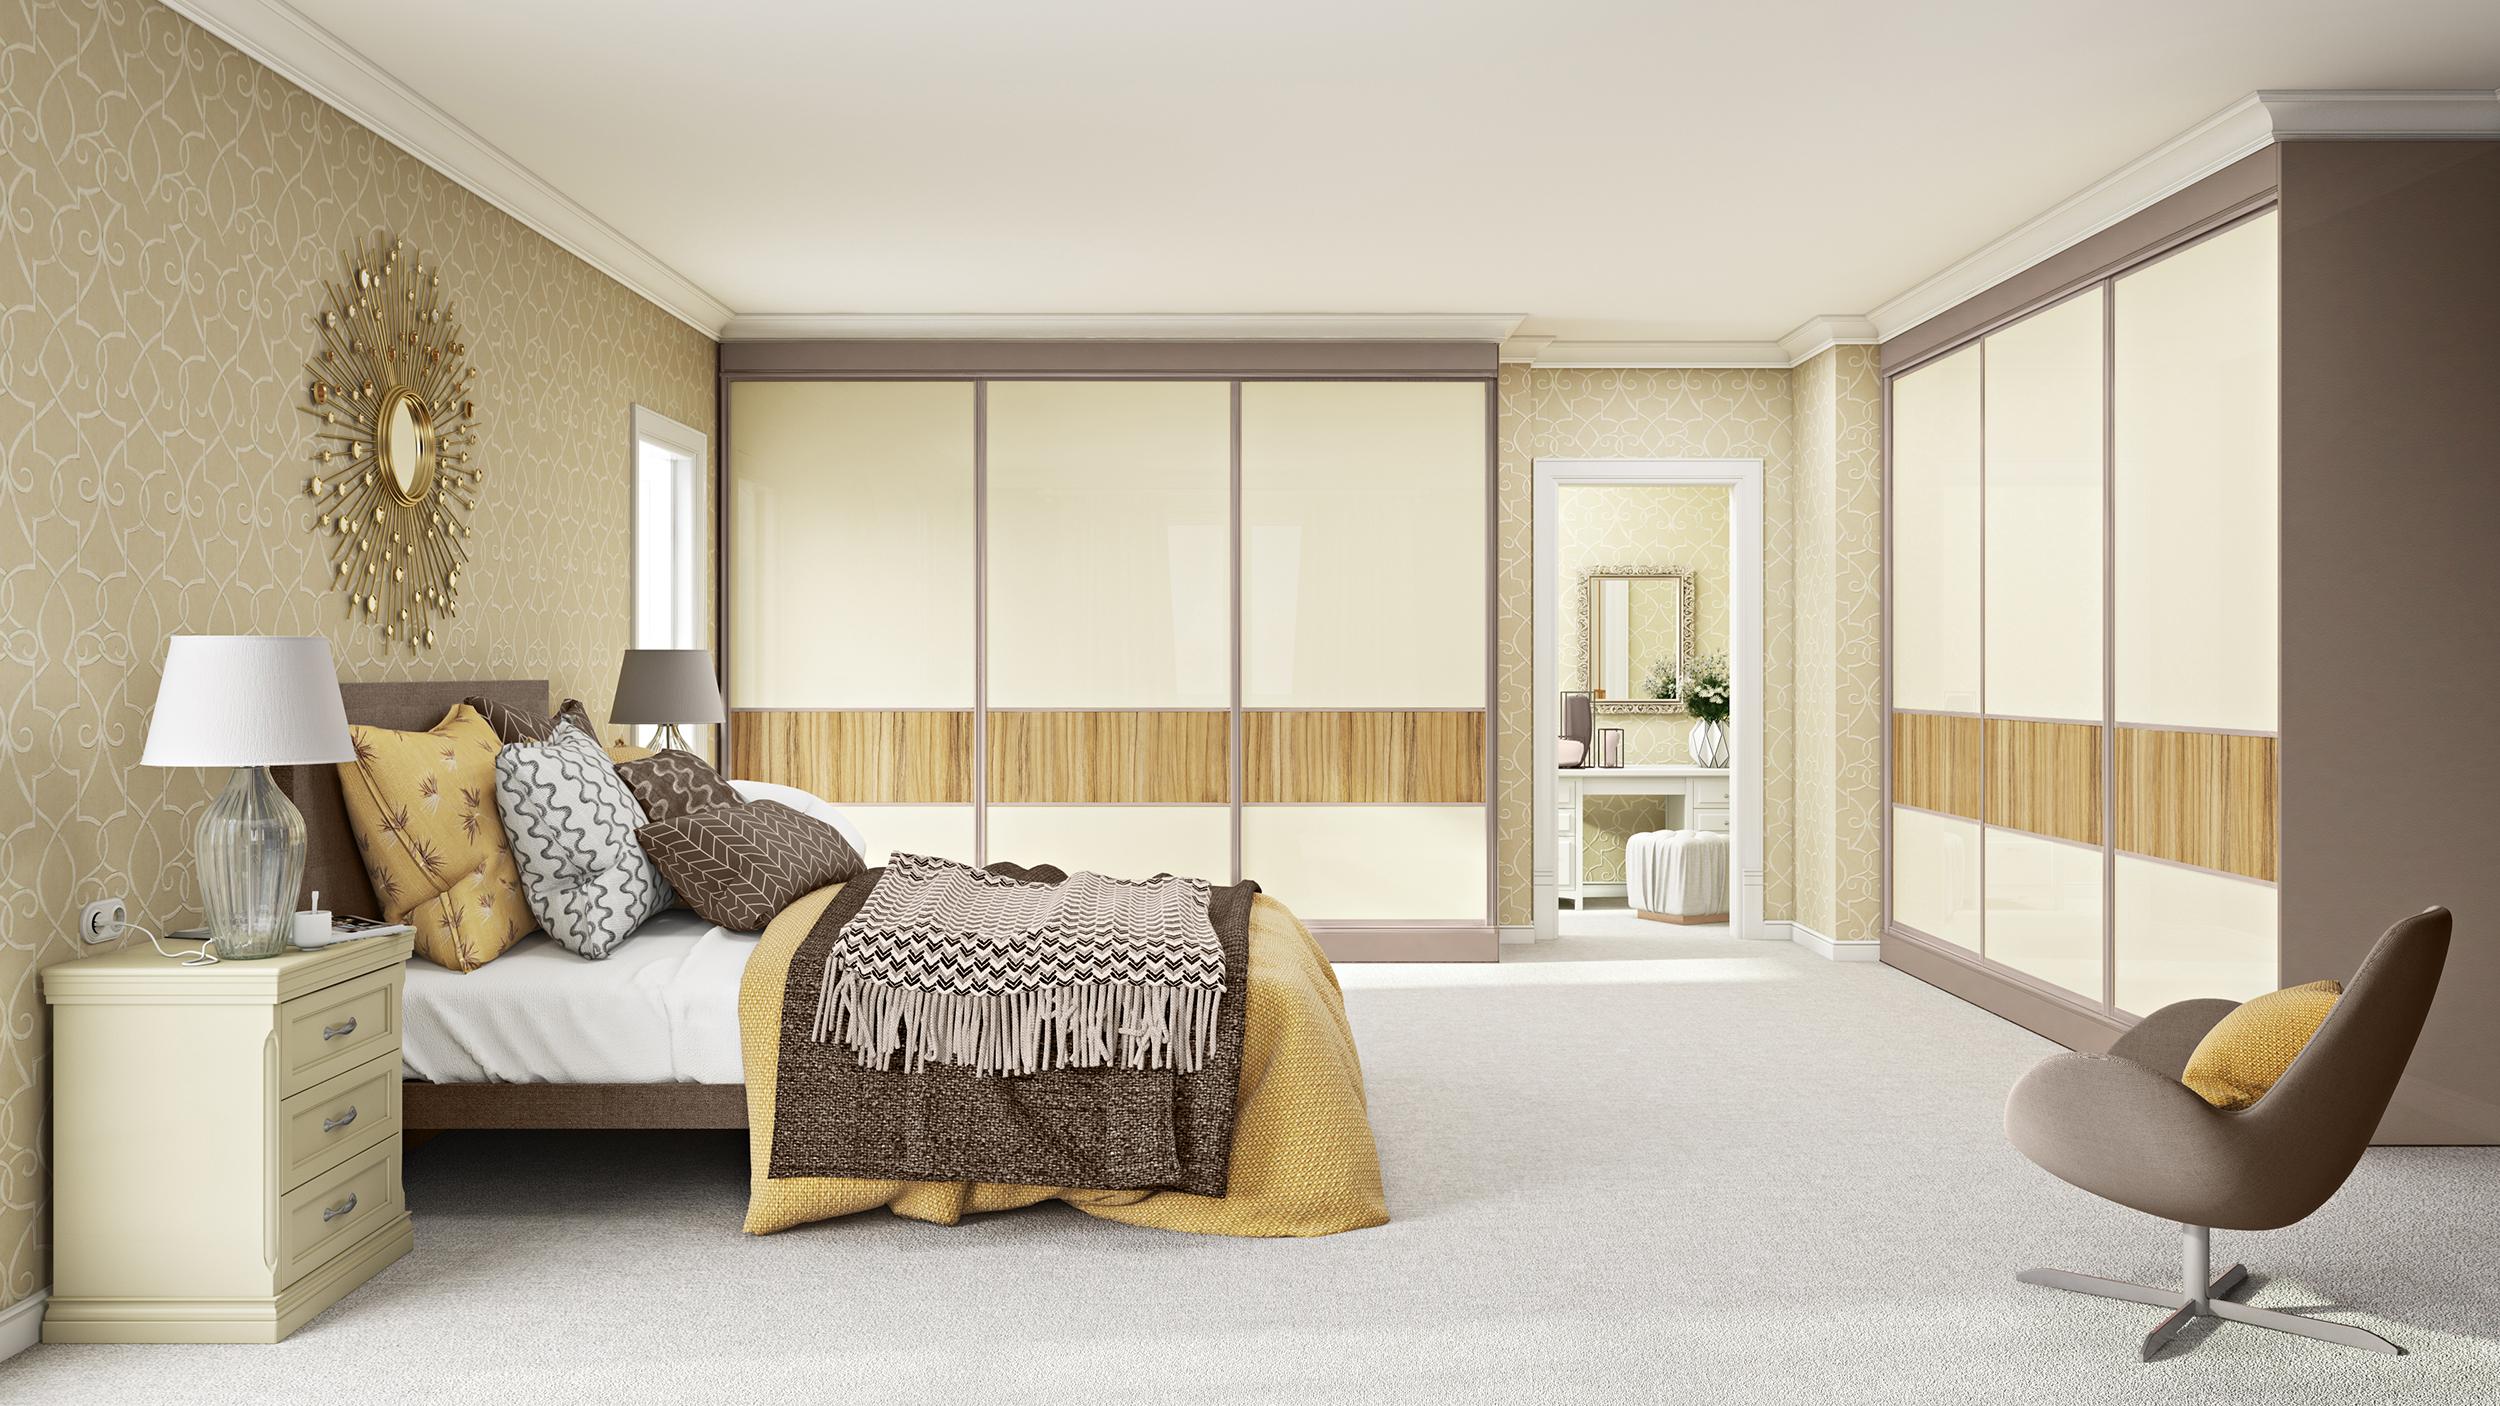 Resized Lazio Oak 407 - Crema Beige doors with Coco Bolo feature panels, Sardegna Stone Grey frame and Stone grey Externo.jpg